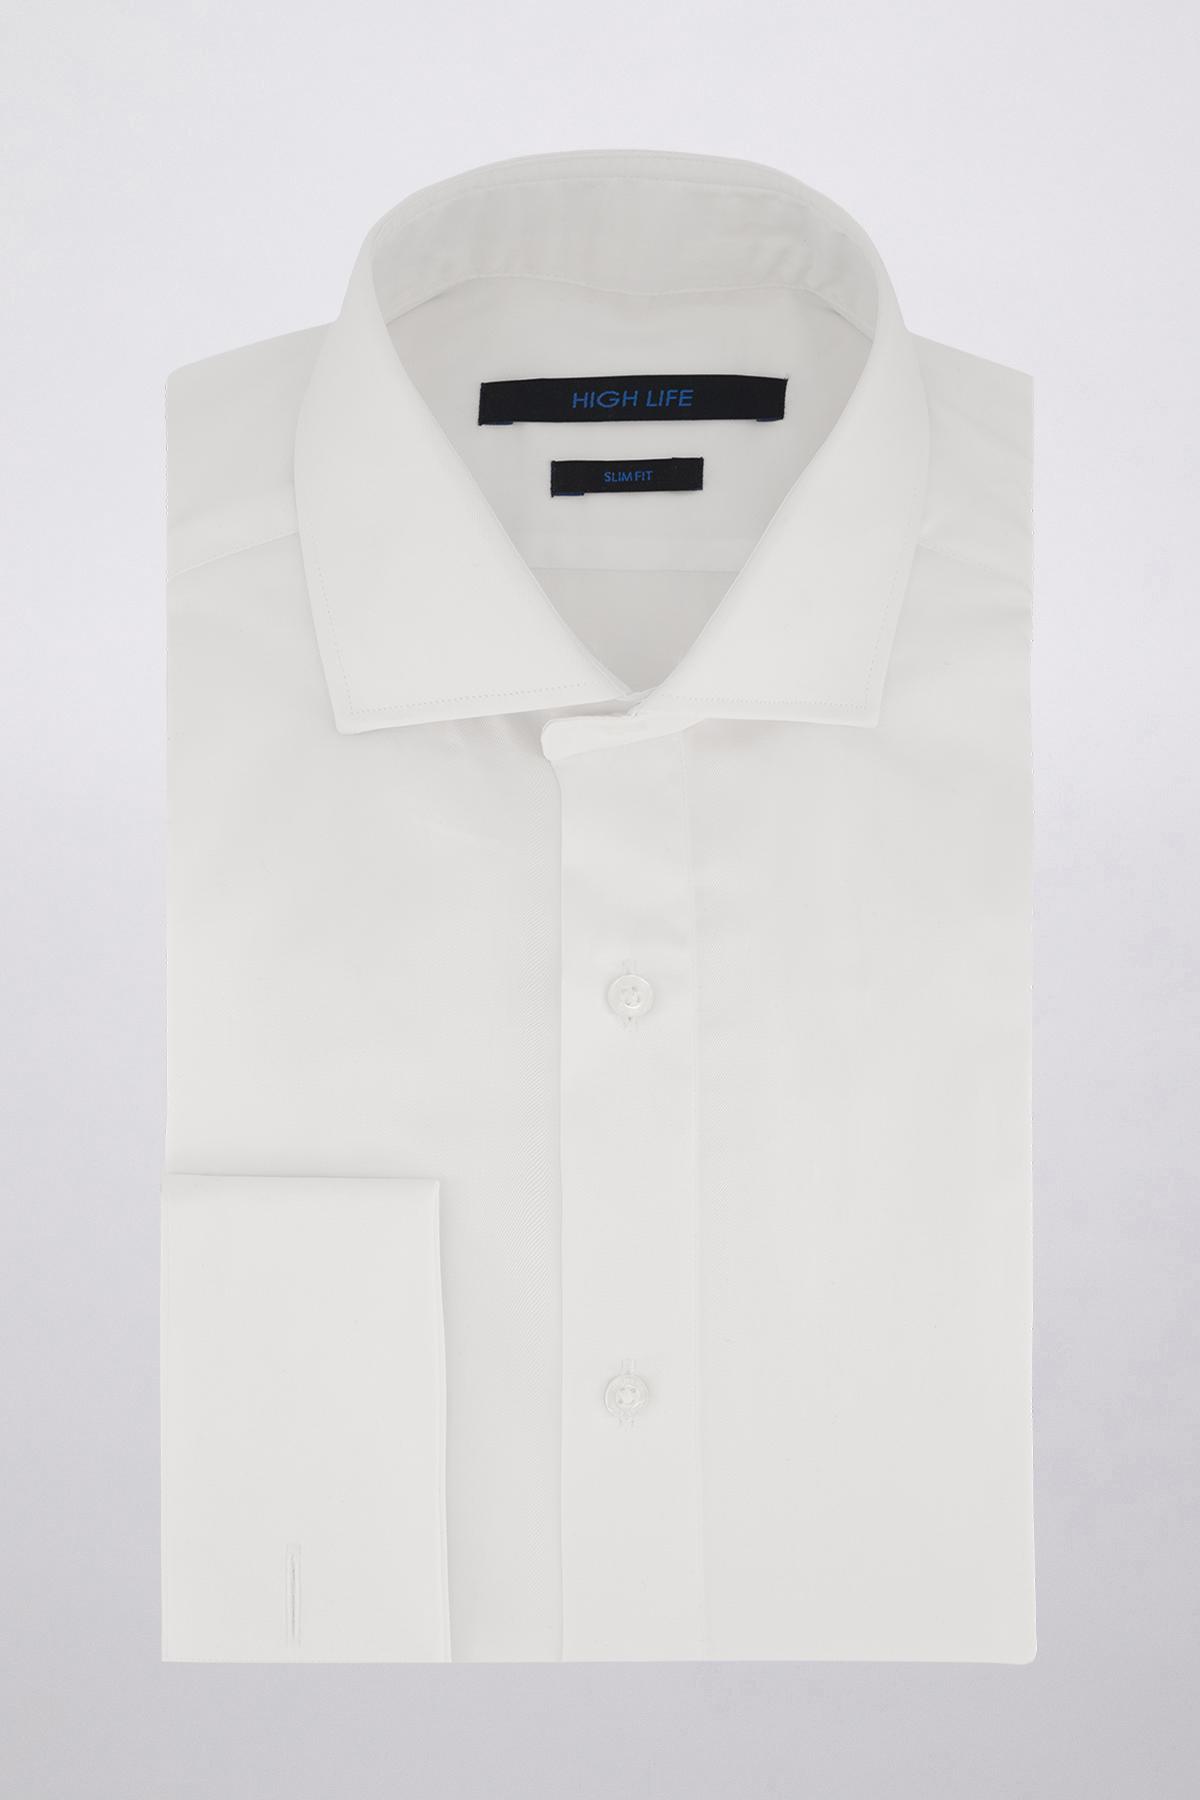 Camisa Vestir marca HIGH LIFE color Blanco